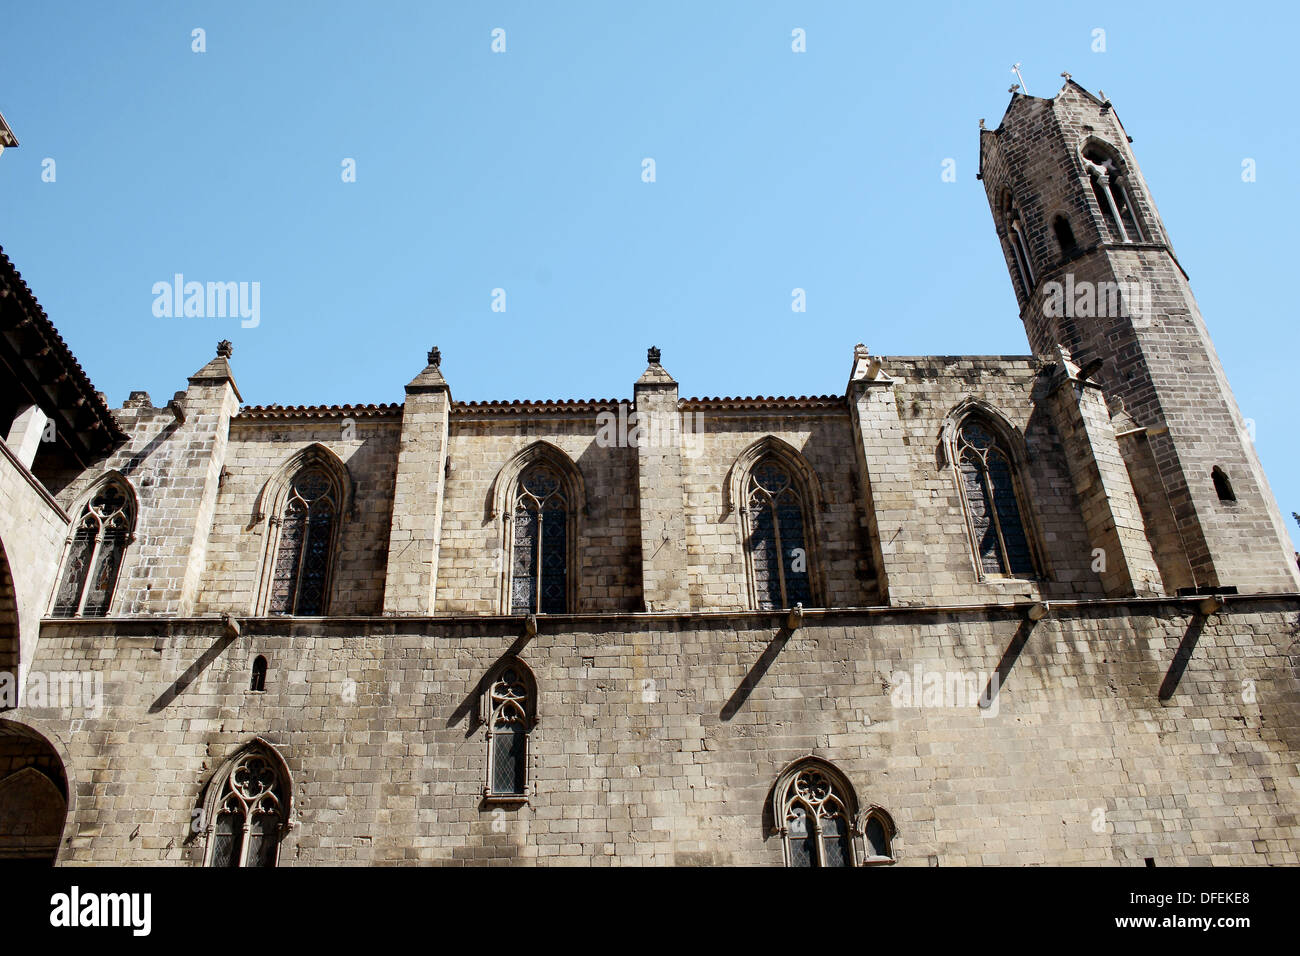 Royal chapel of Santa Àgata, Plaça del Rei, Gothic quarter, Barcelona, Spain - Stock Image